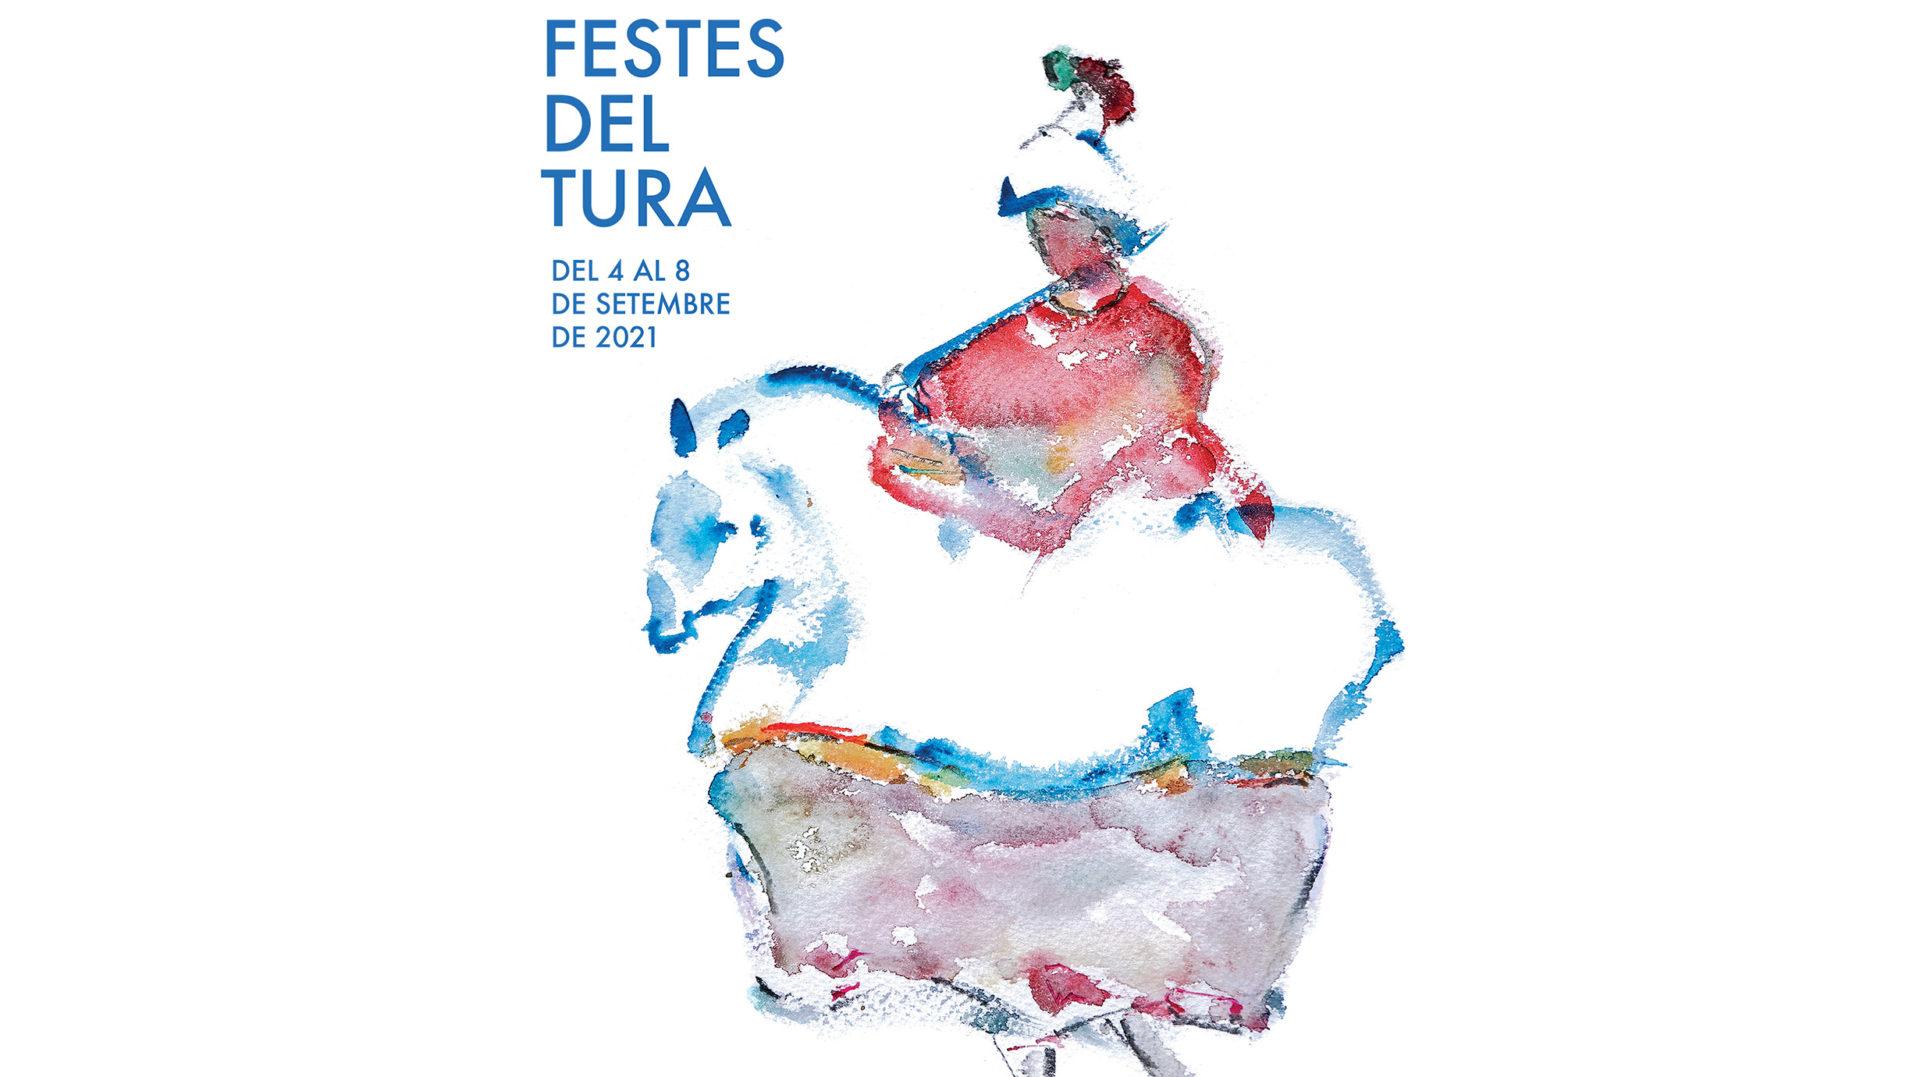 Festes del Tura